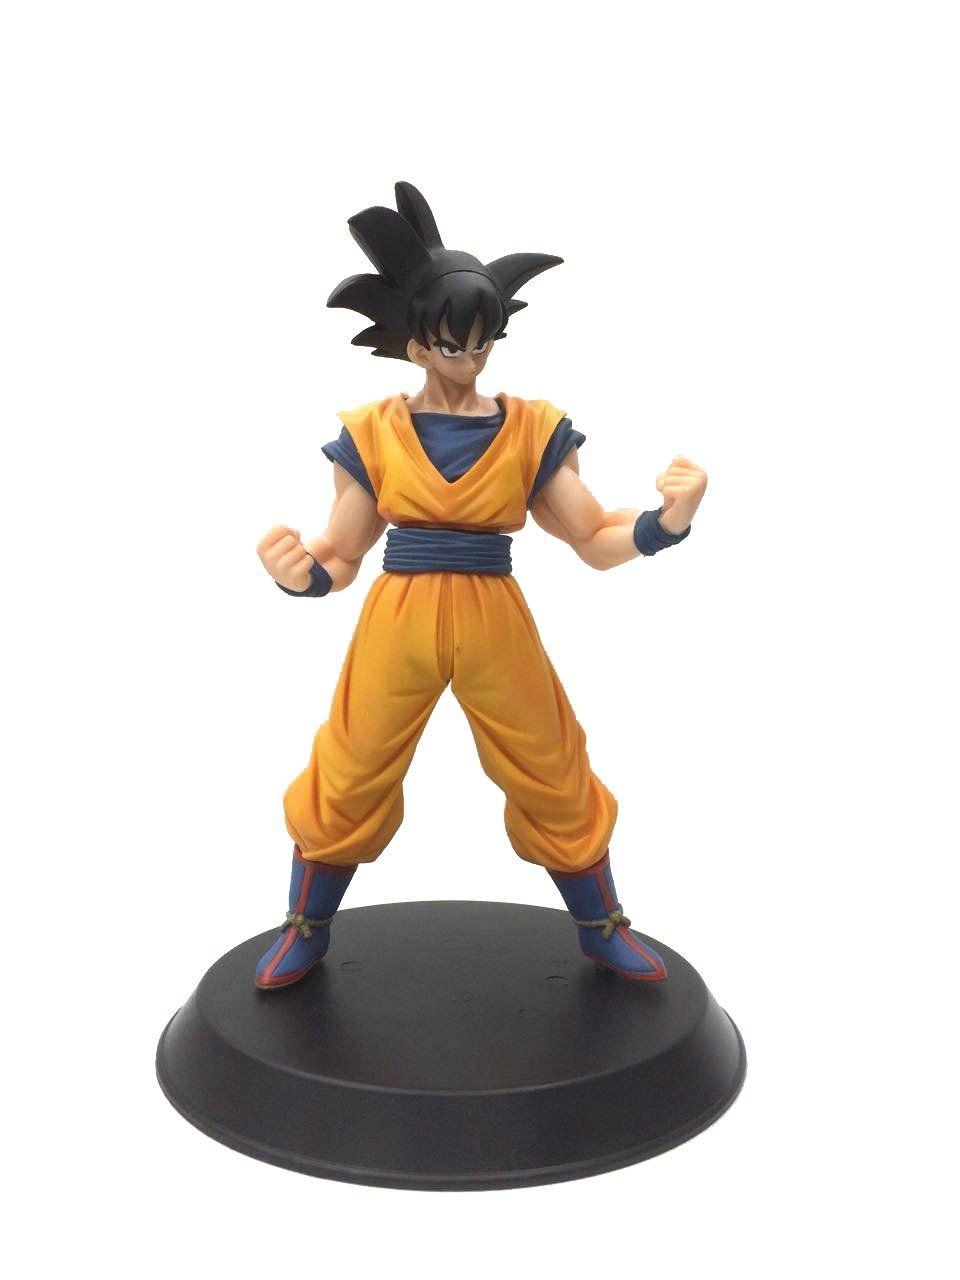 Estátua Goku: Dragon Ball Z - Banpresto